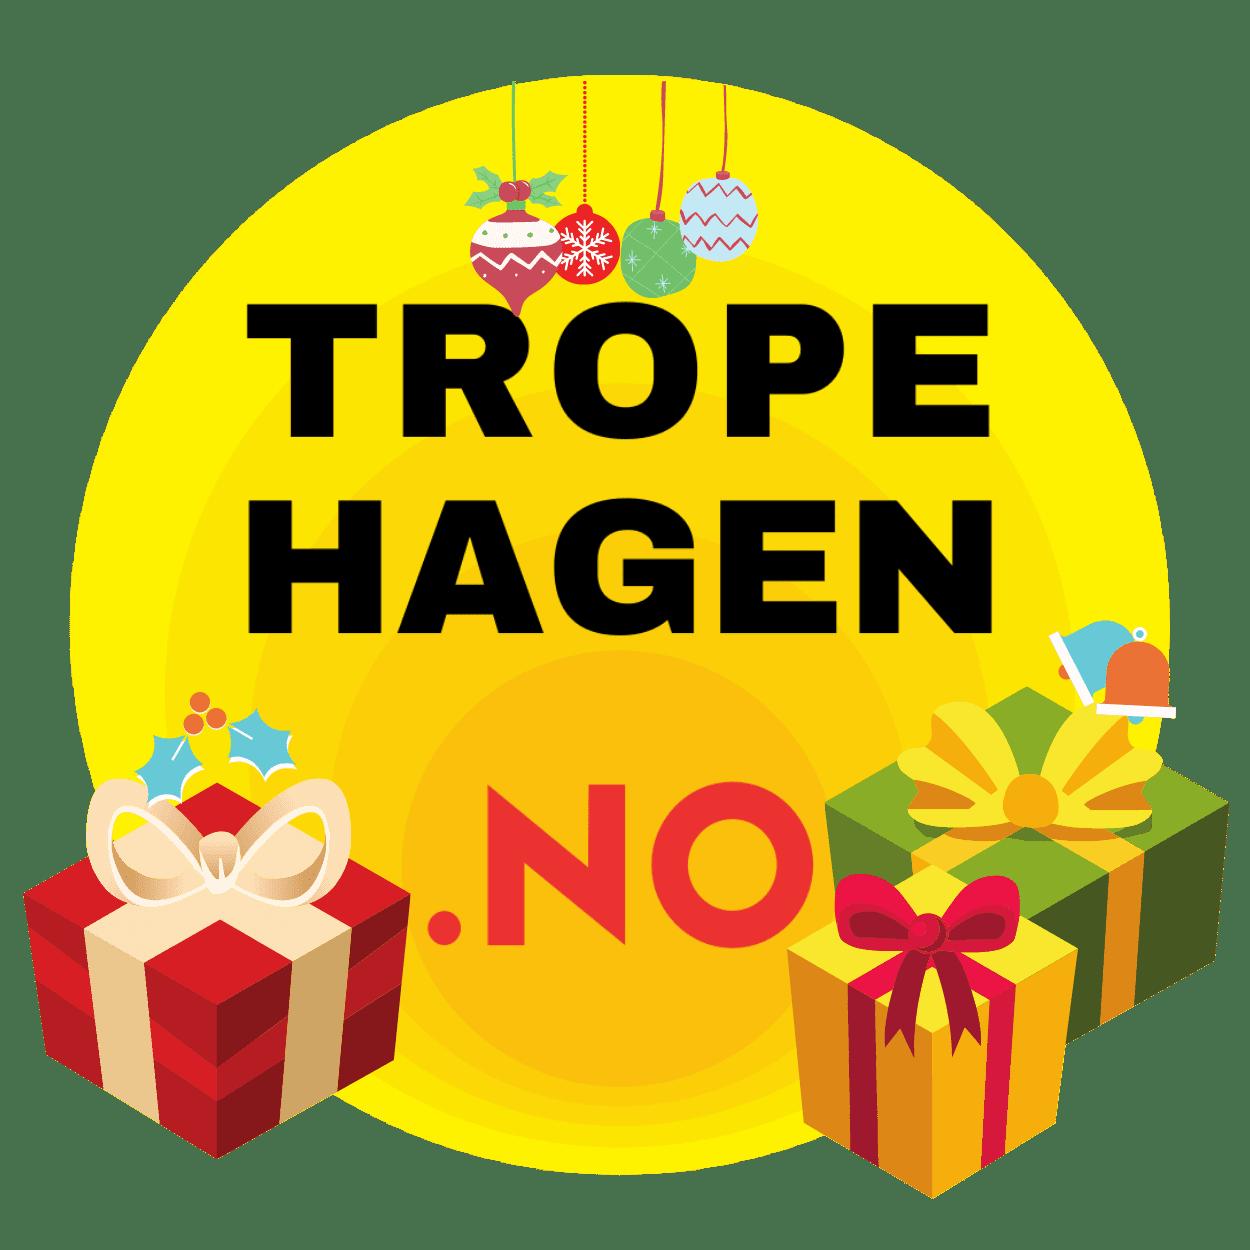 Tropehagen.no julelogo